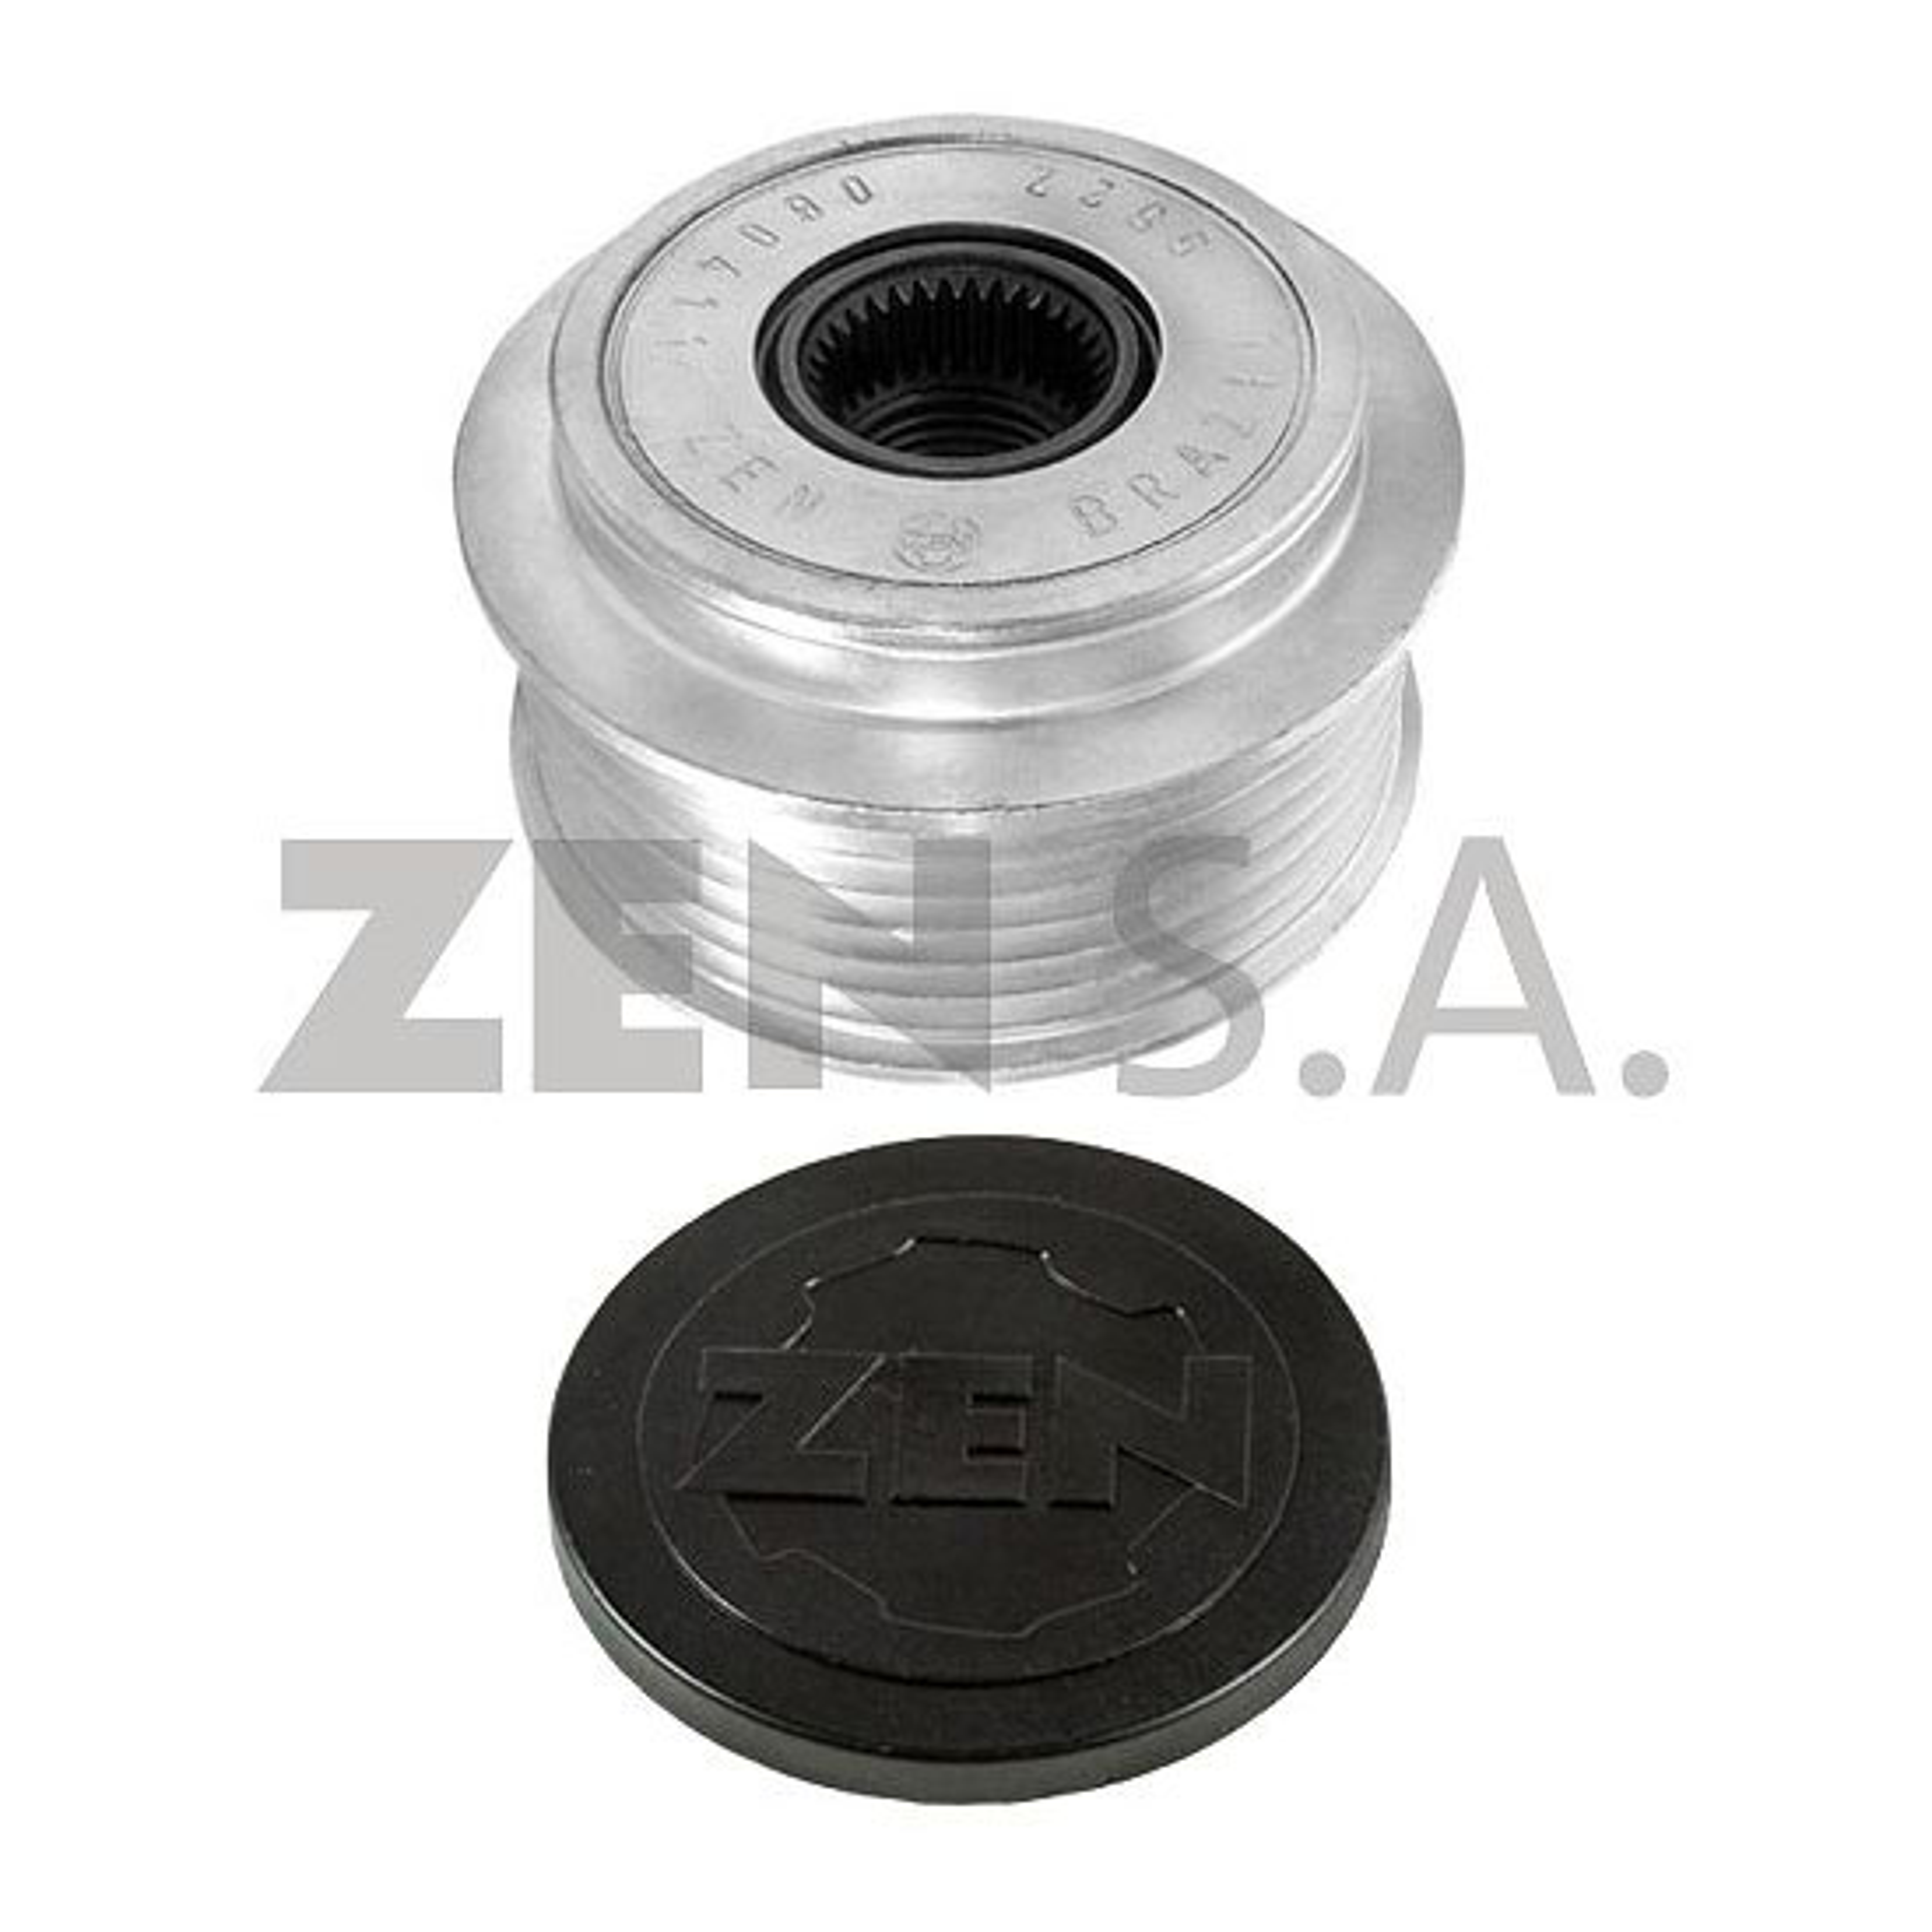 Polia Alternador Roda Livre FRONTIER 2.5 (ZEN5522)